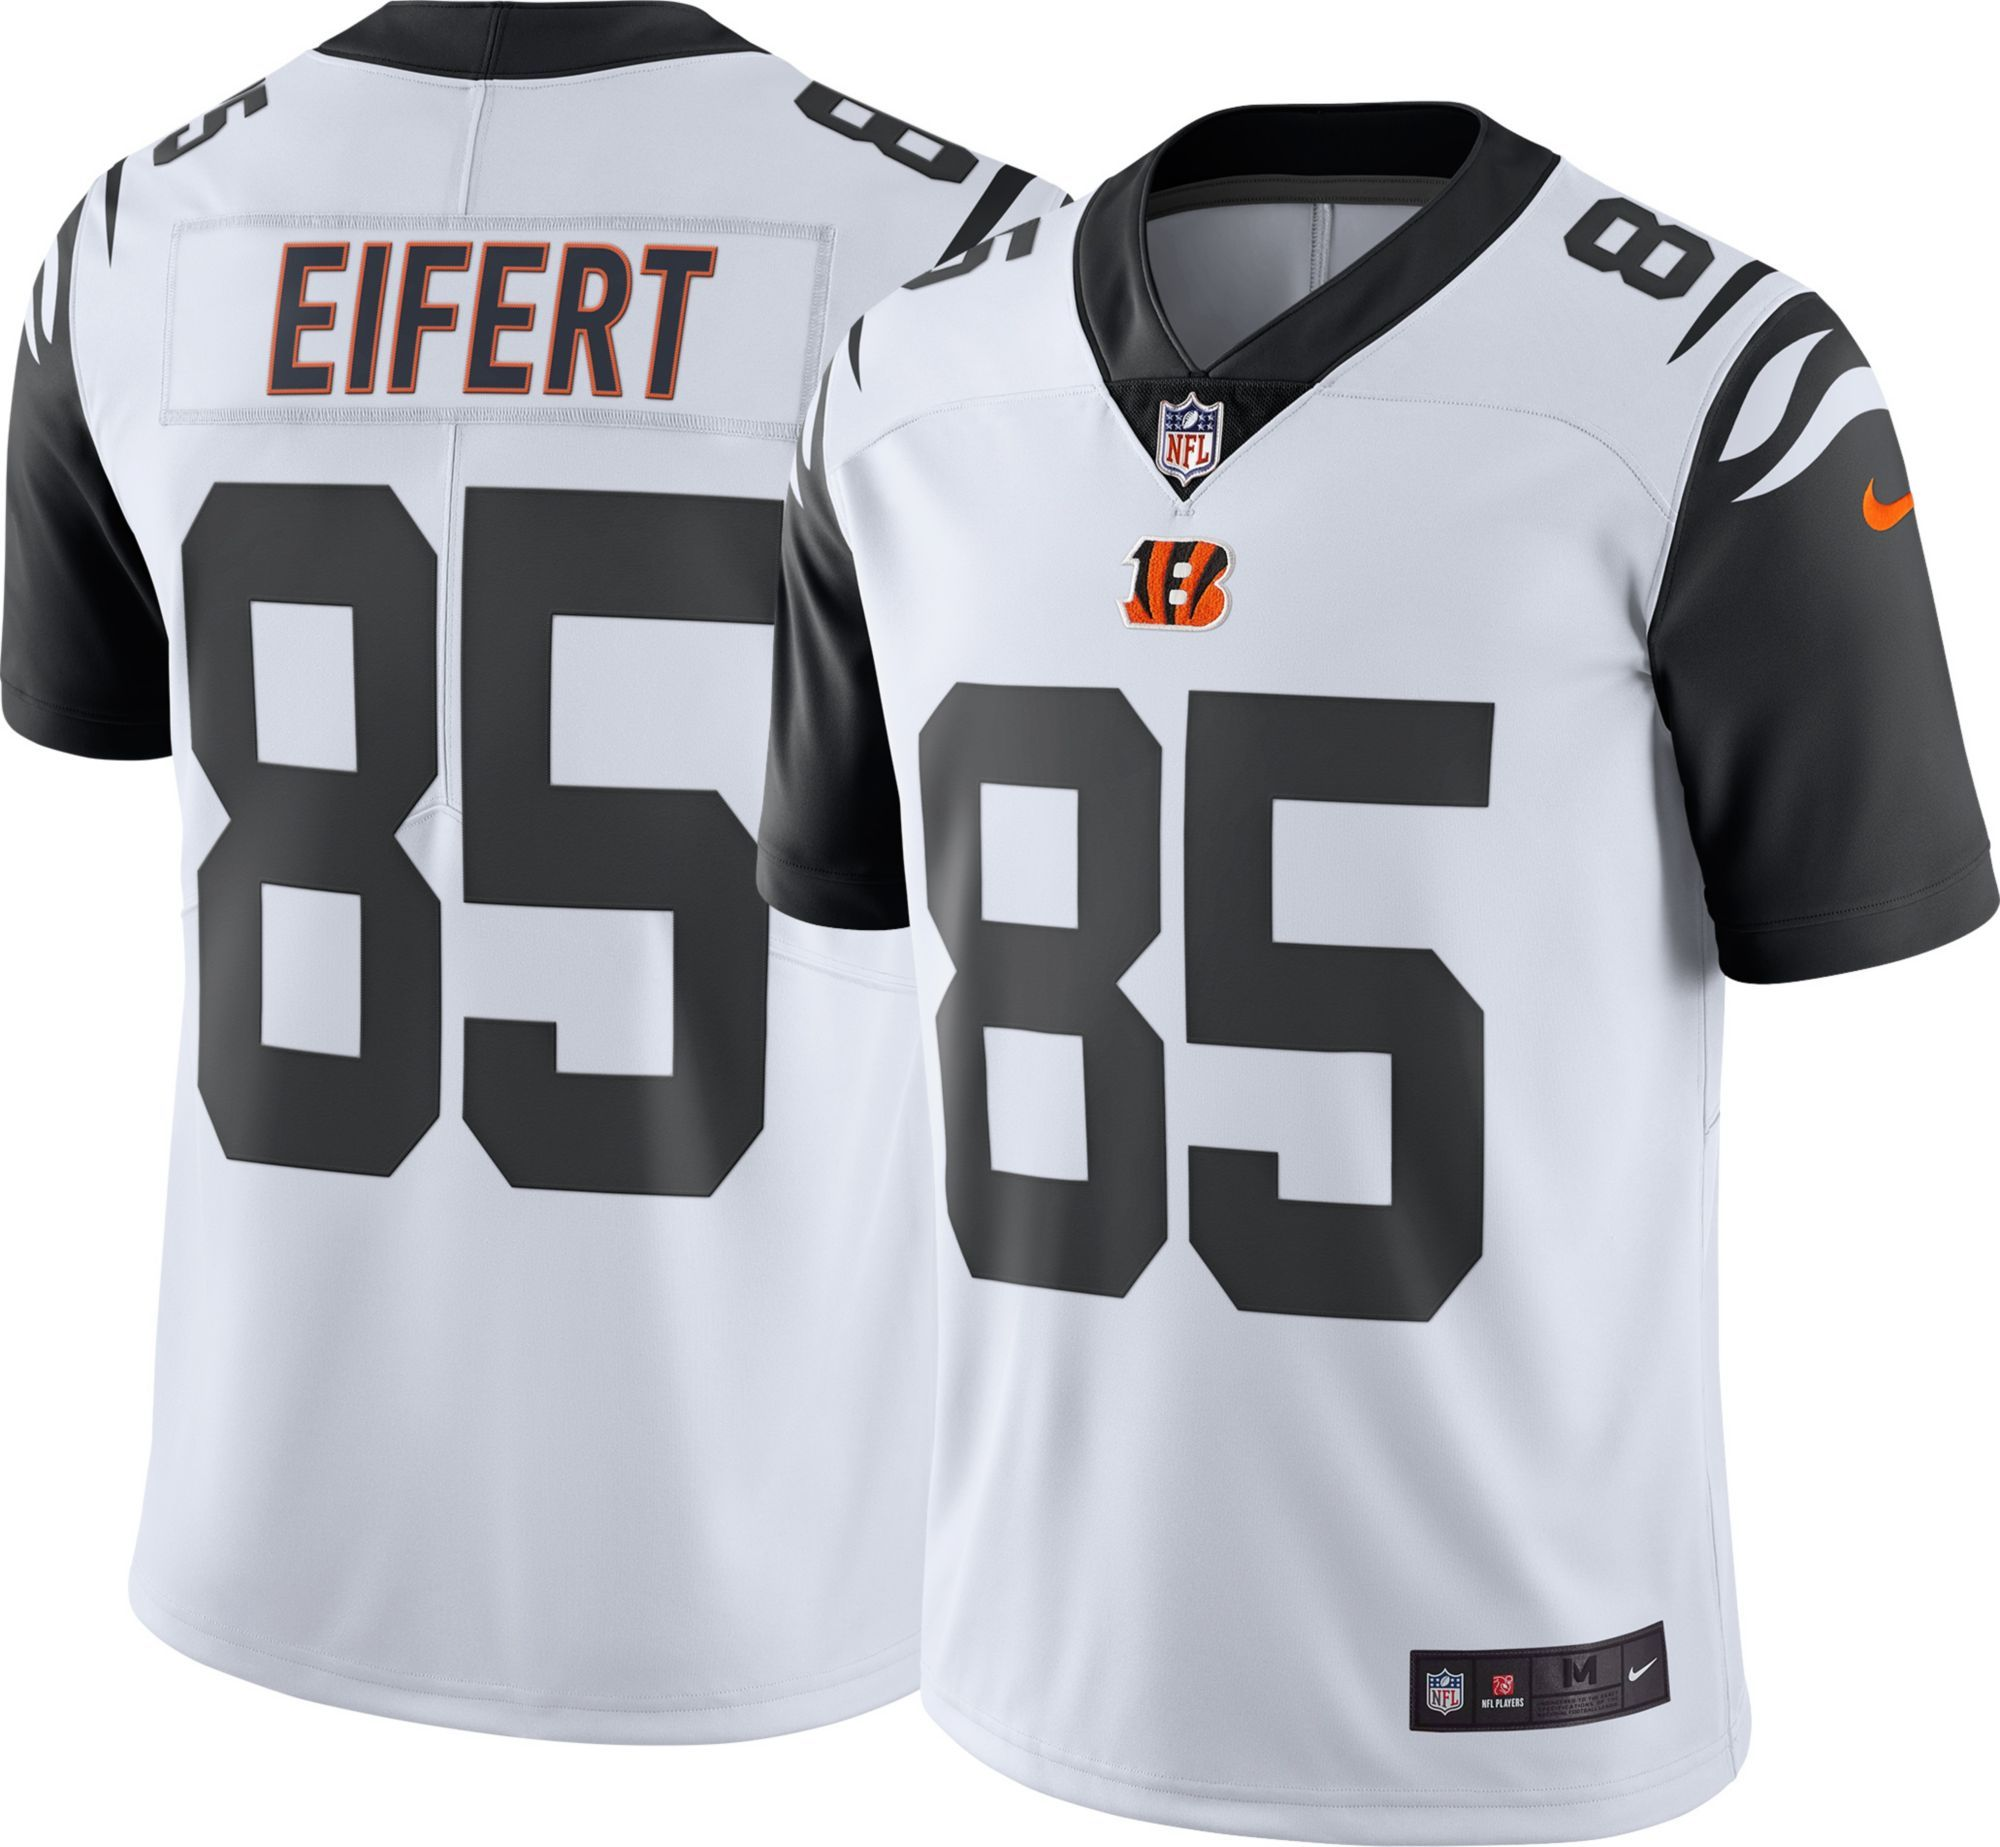 detailed look 37e4d 90b2d Nike Men's Color Rush Limited Jersey Cincinnati Bengals ...